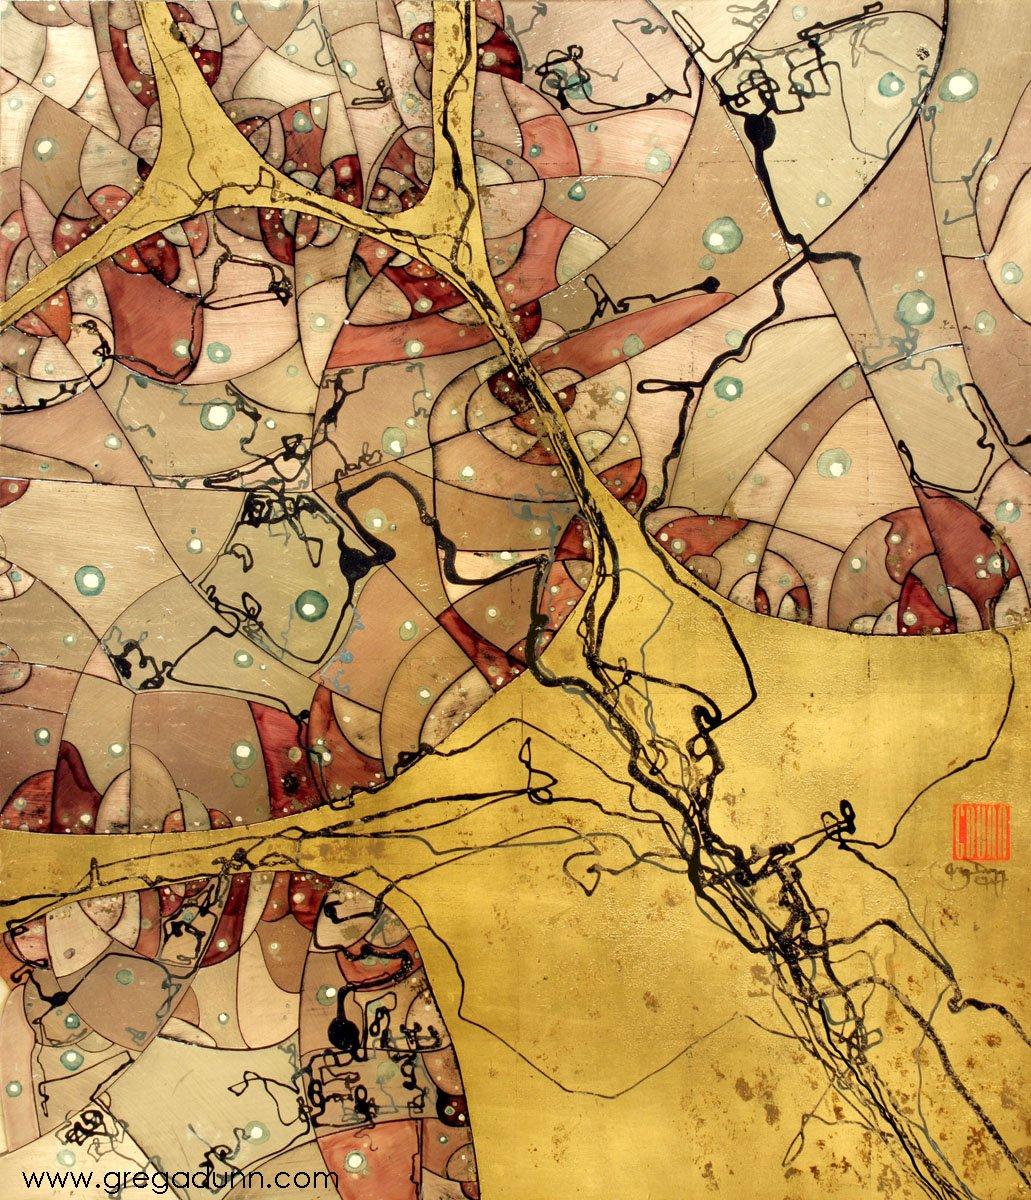 Neuron Cell Worksheets | Neurons, Human body unit study ... |Neurons Art